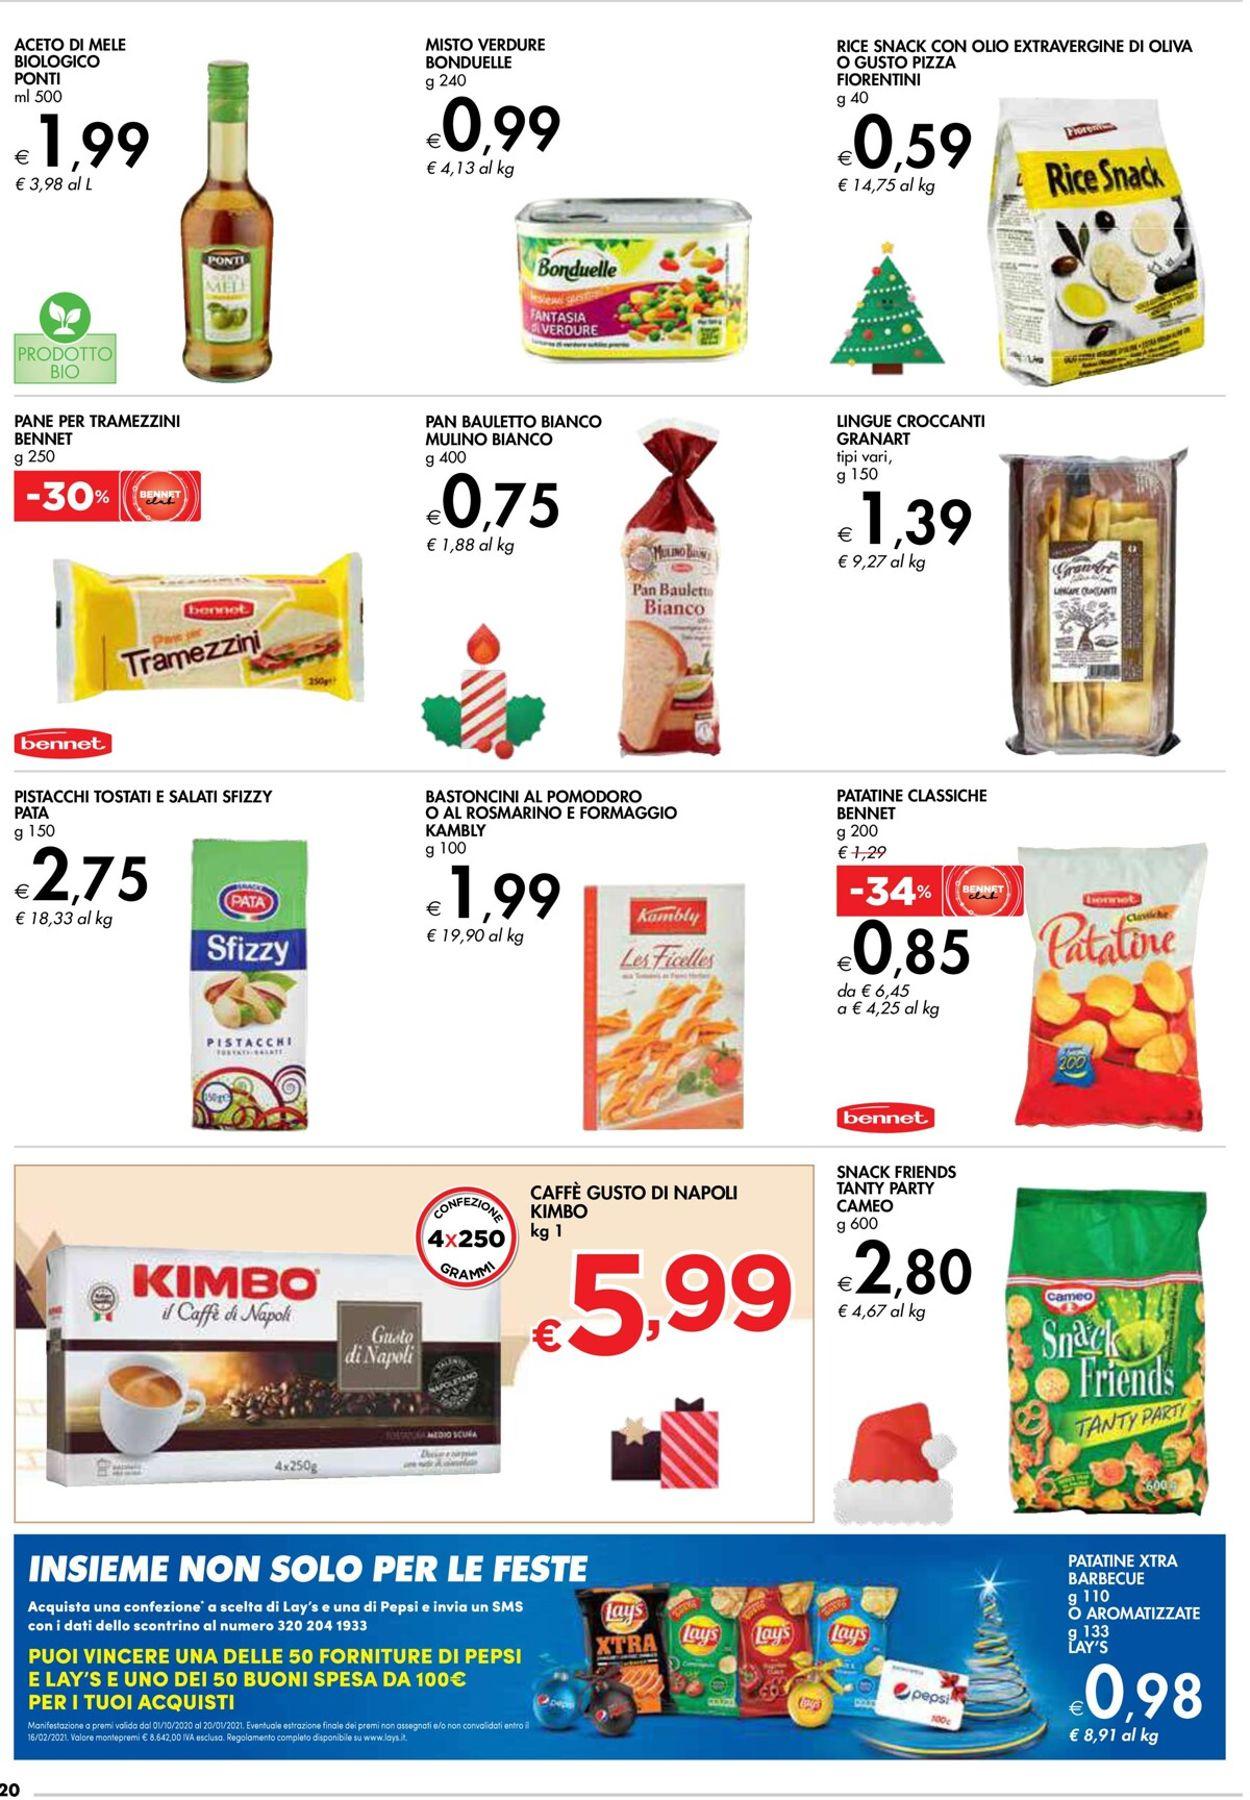 Volantino bennet - Natale 2020 - Offerte 10/12-24/12/2020 (Pagina 20)